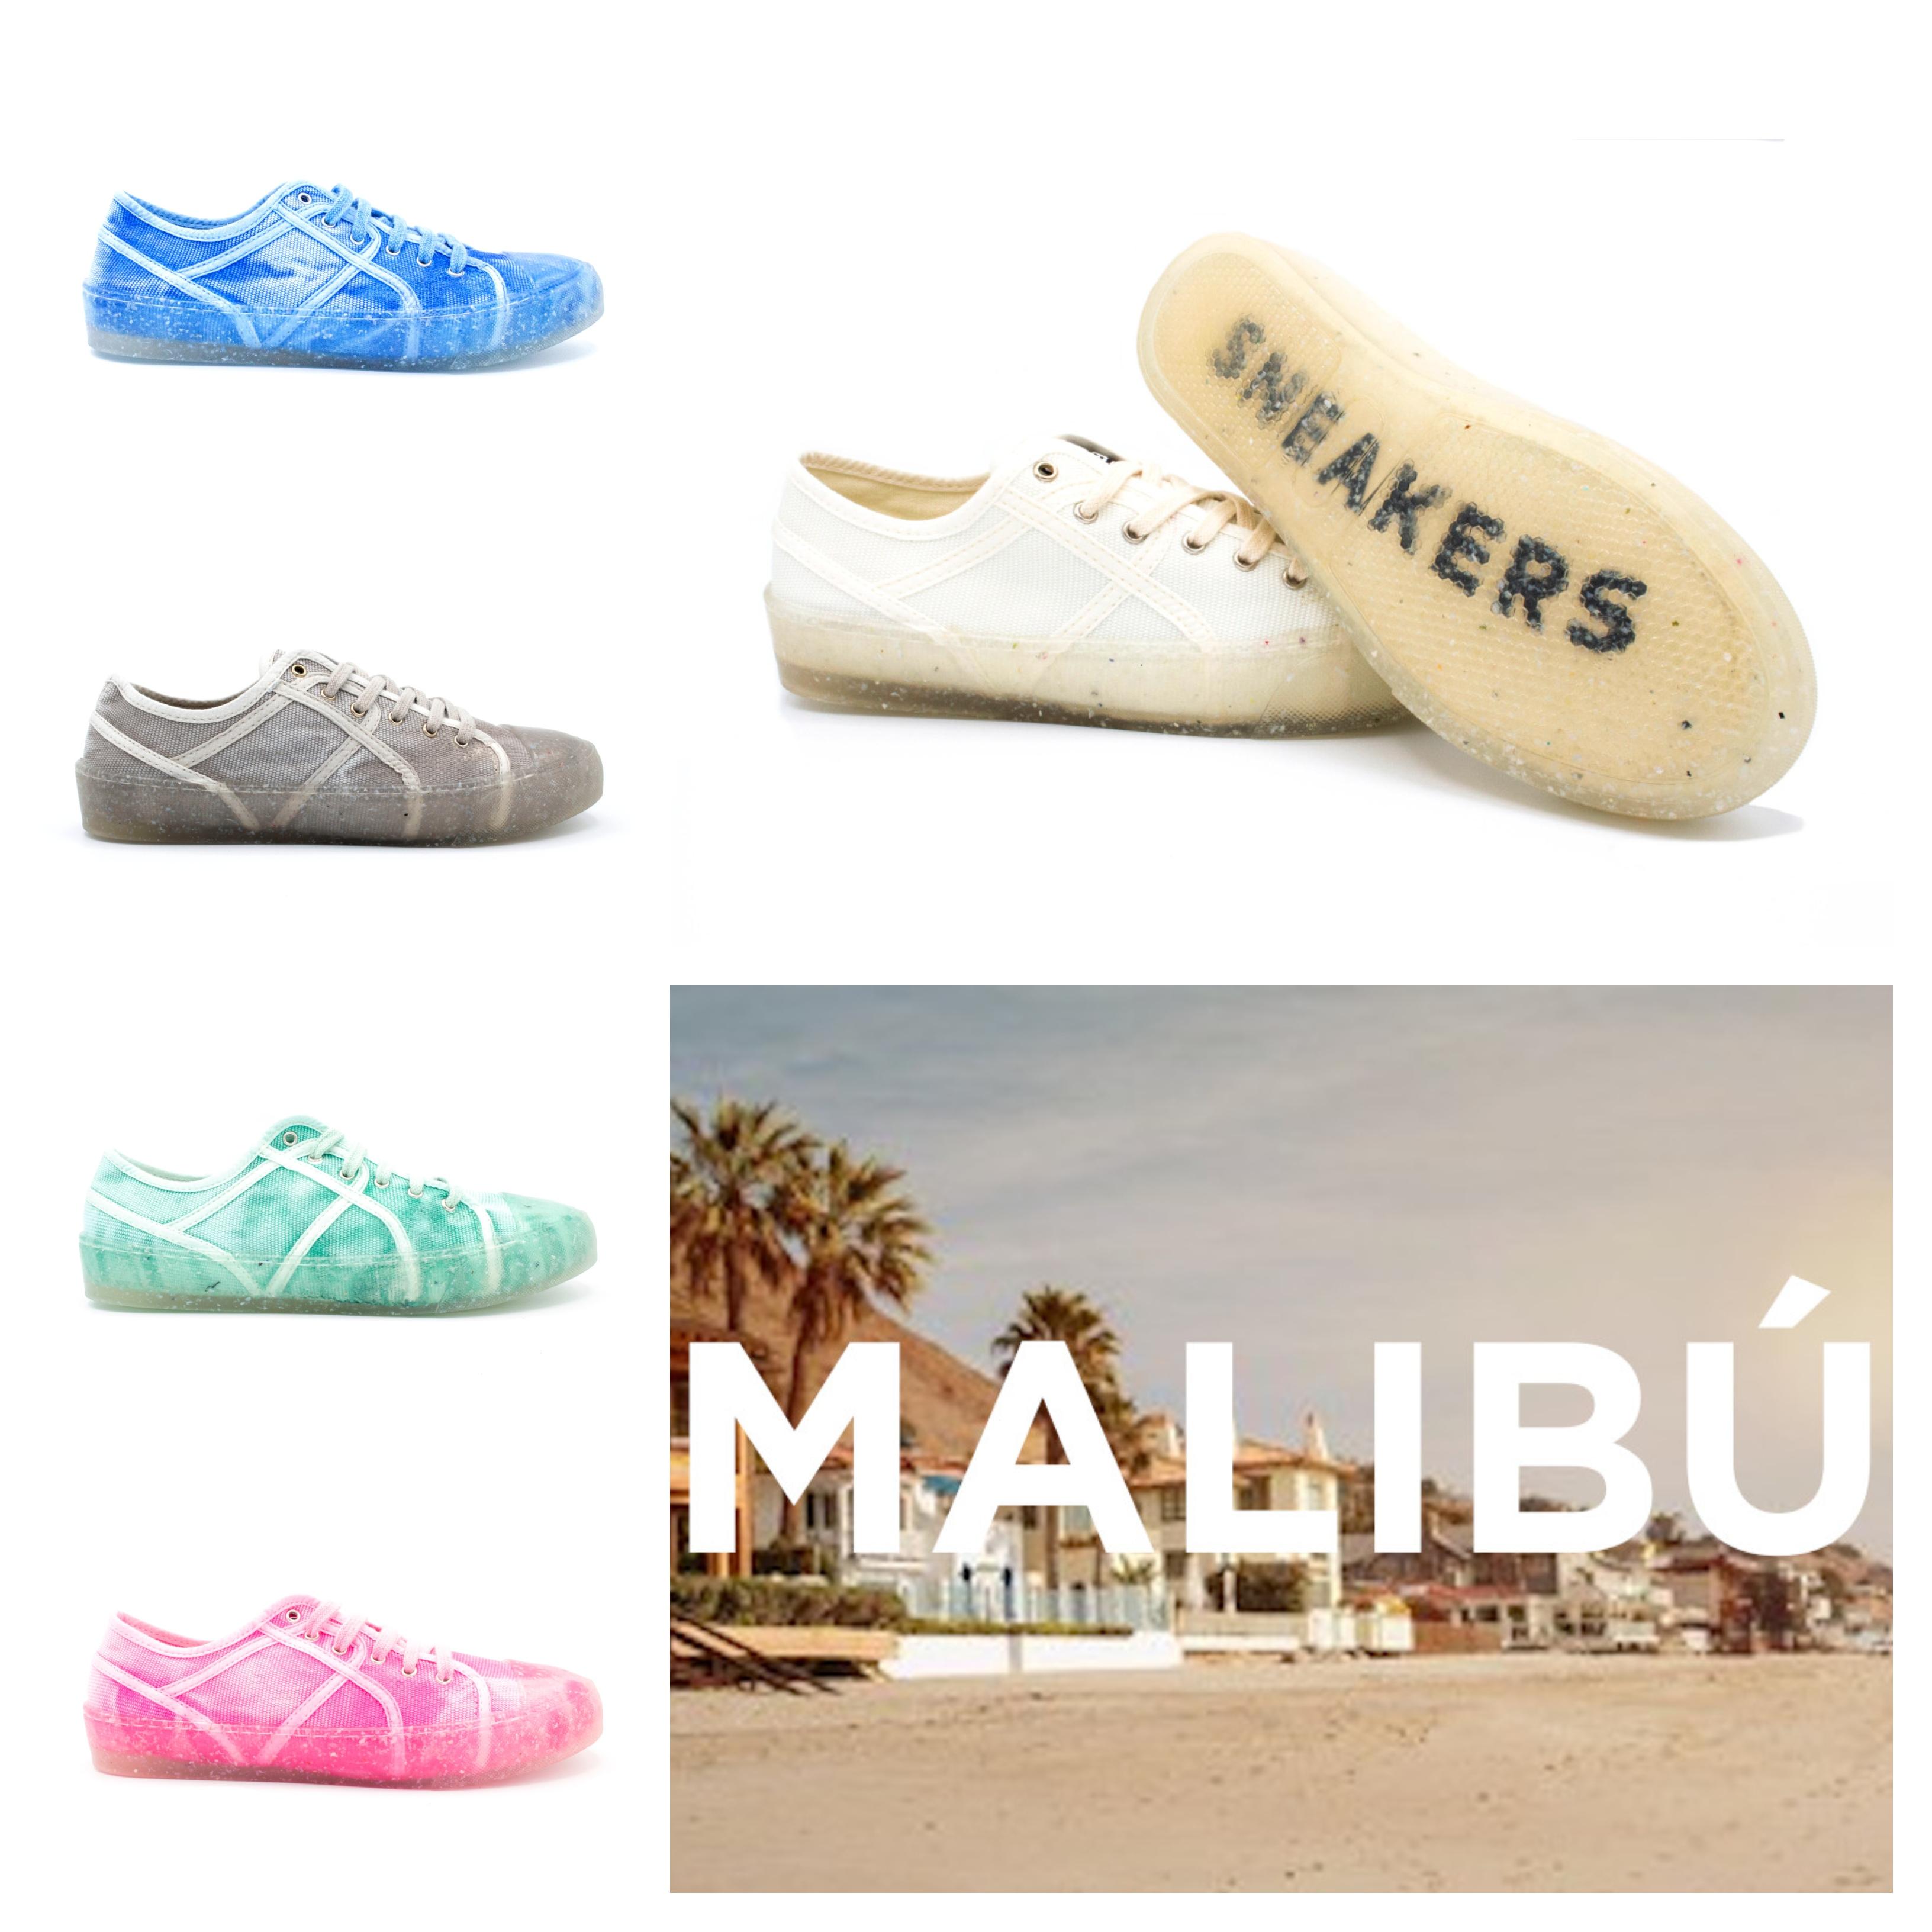 coleccion-malibu-zapatos-mujer.jpg